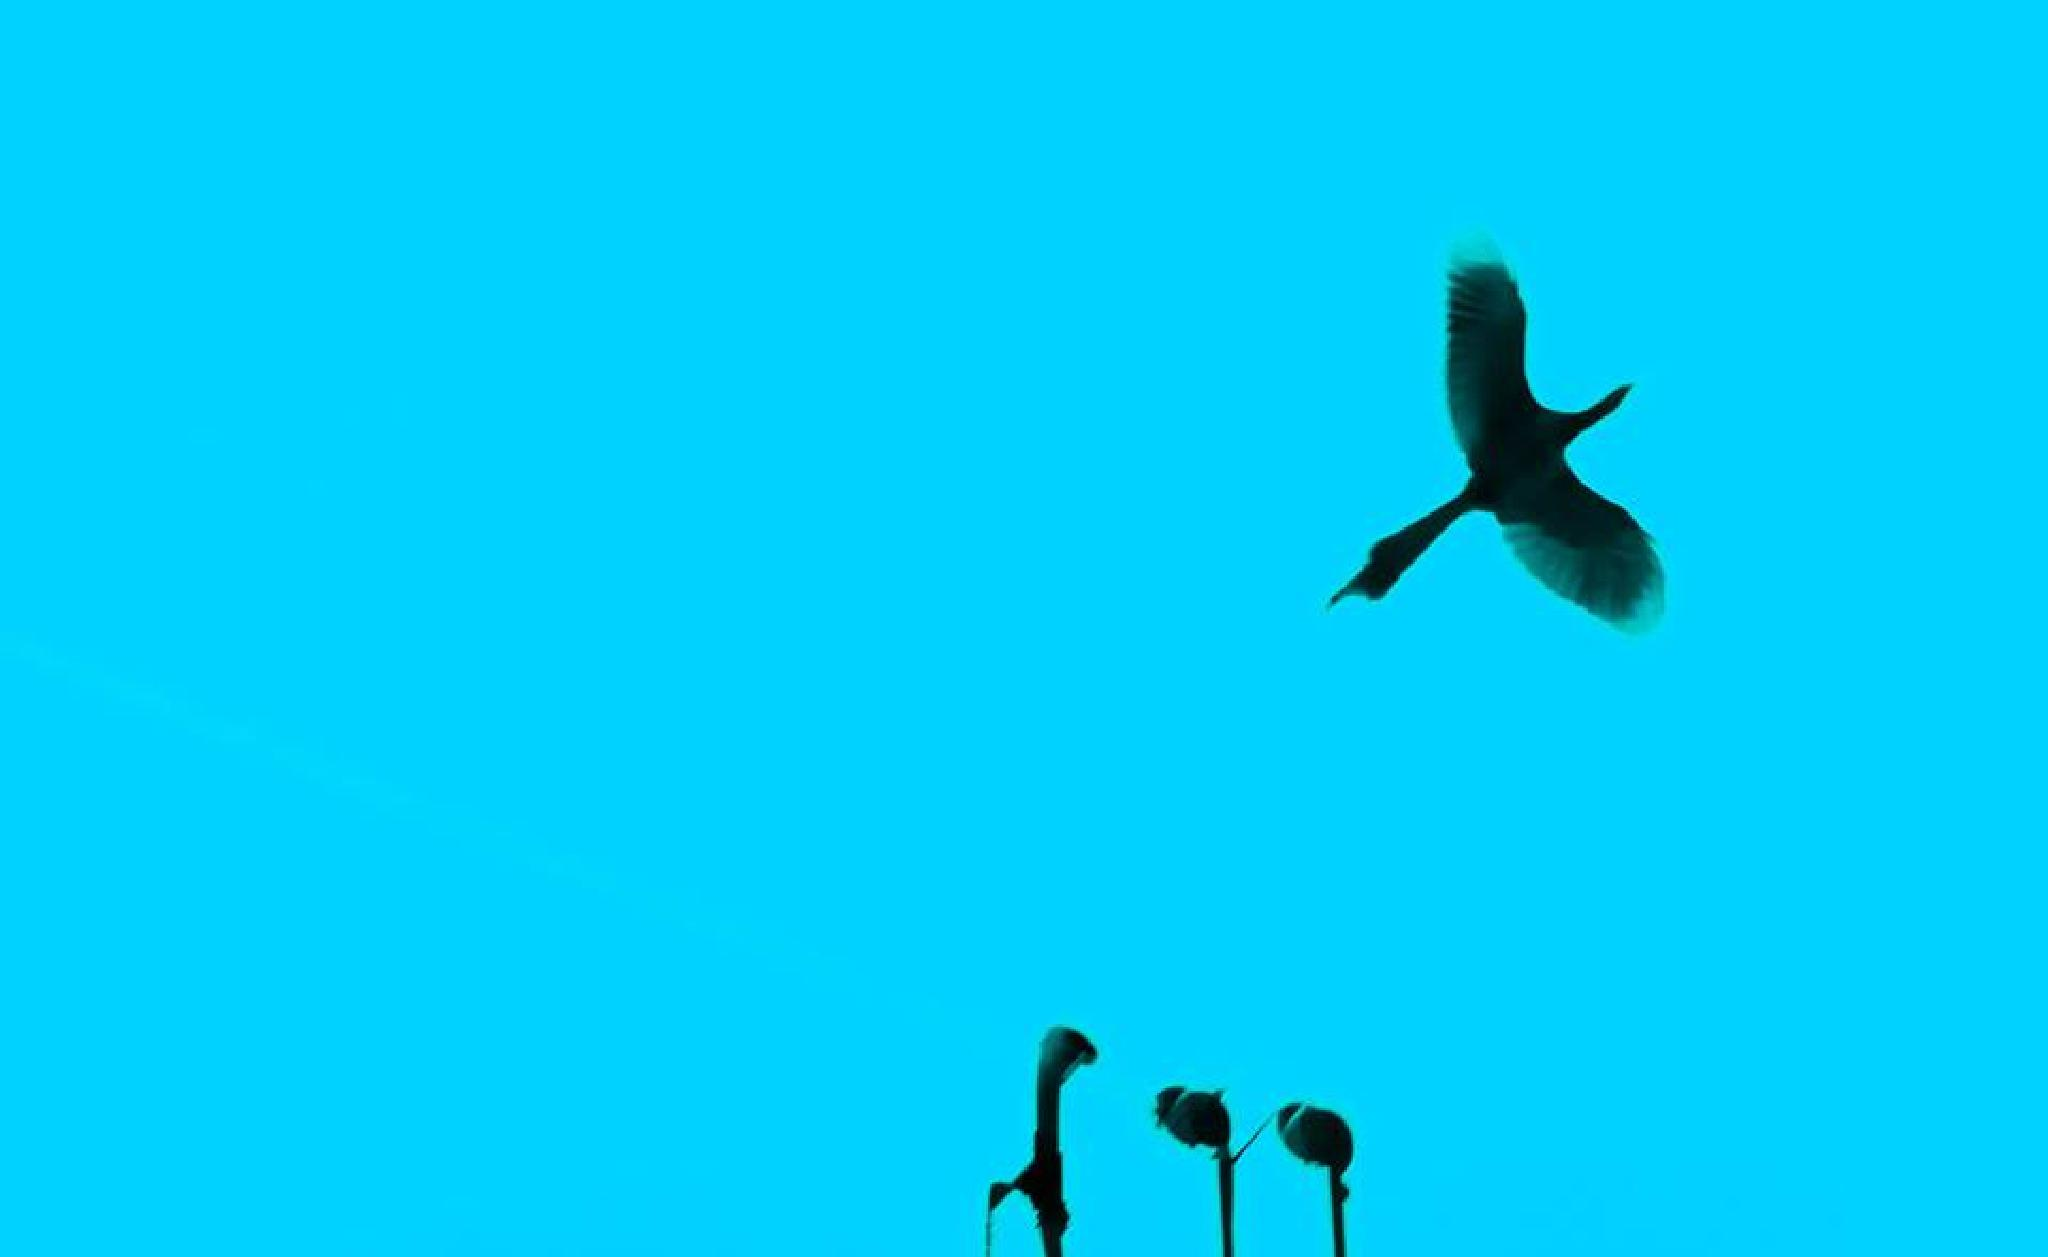 flight by ahmedgulshir